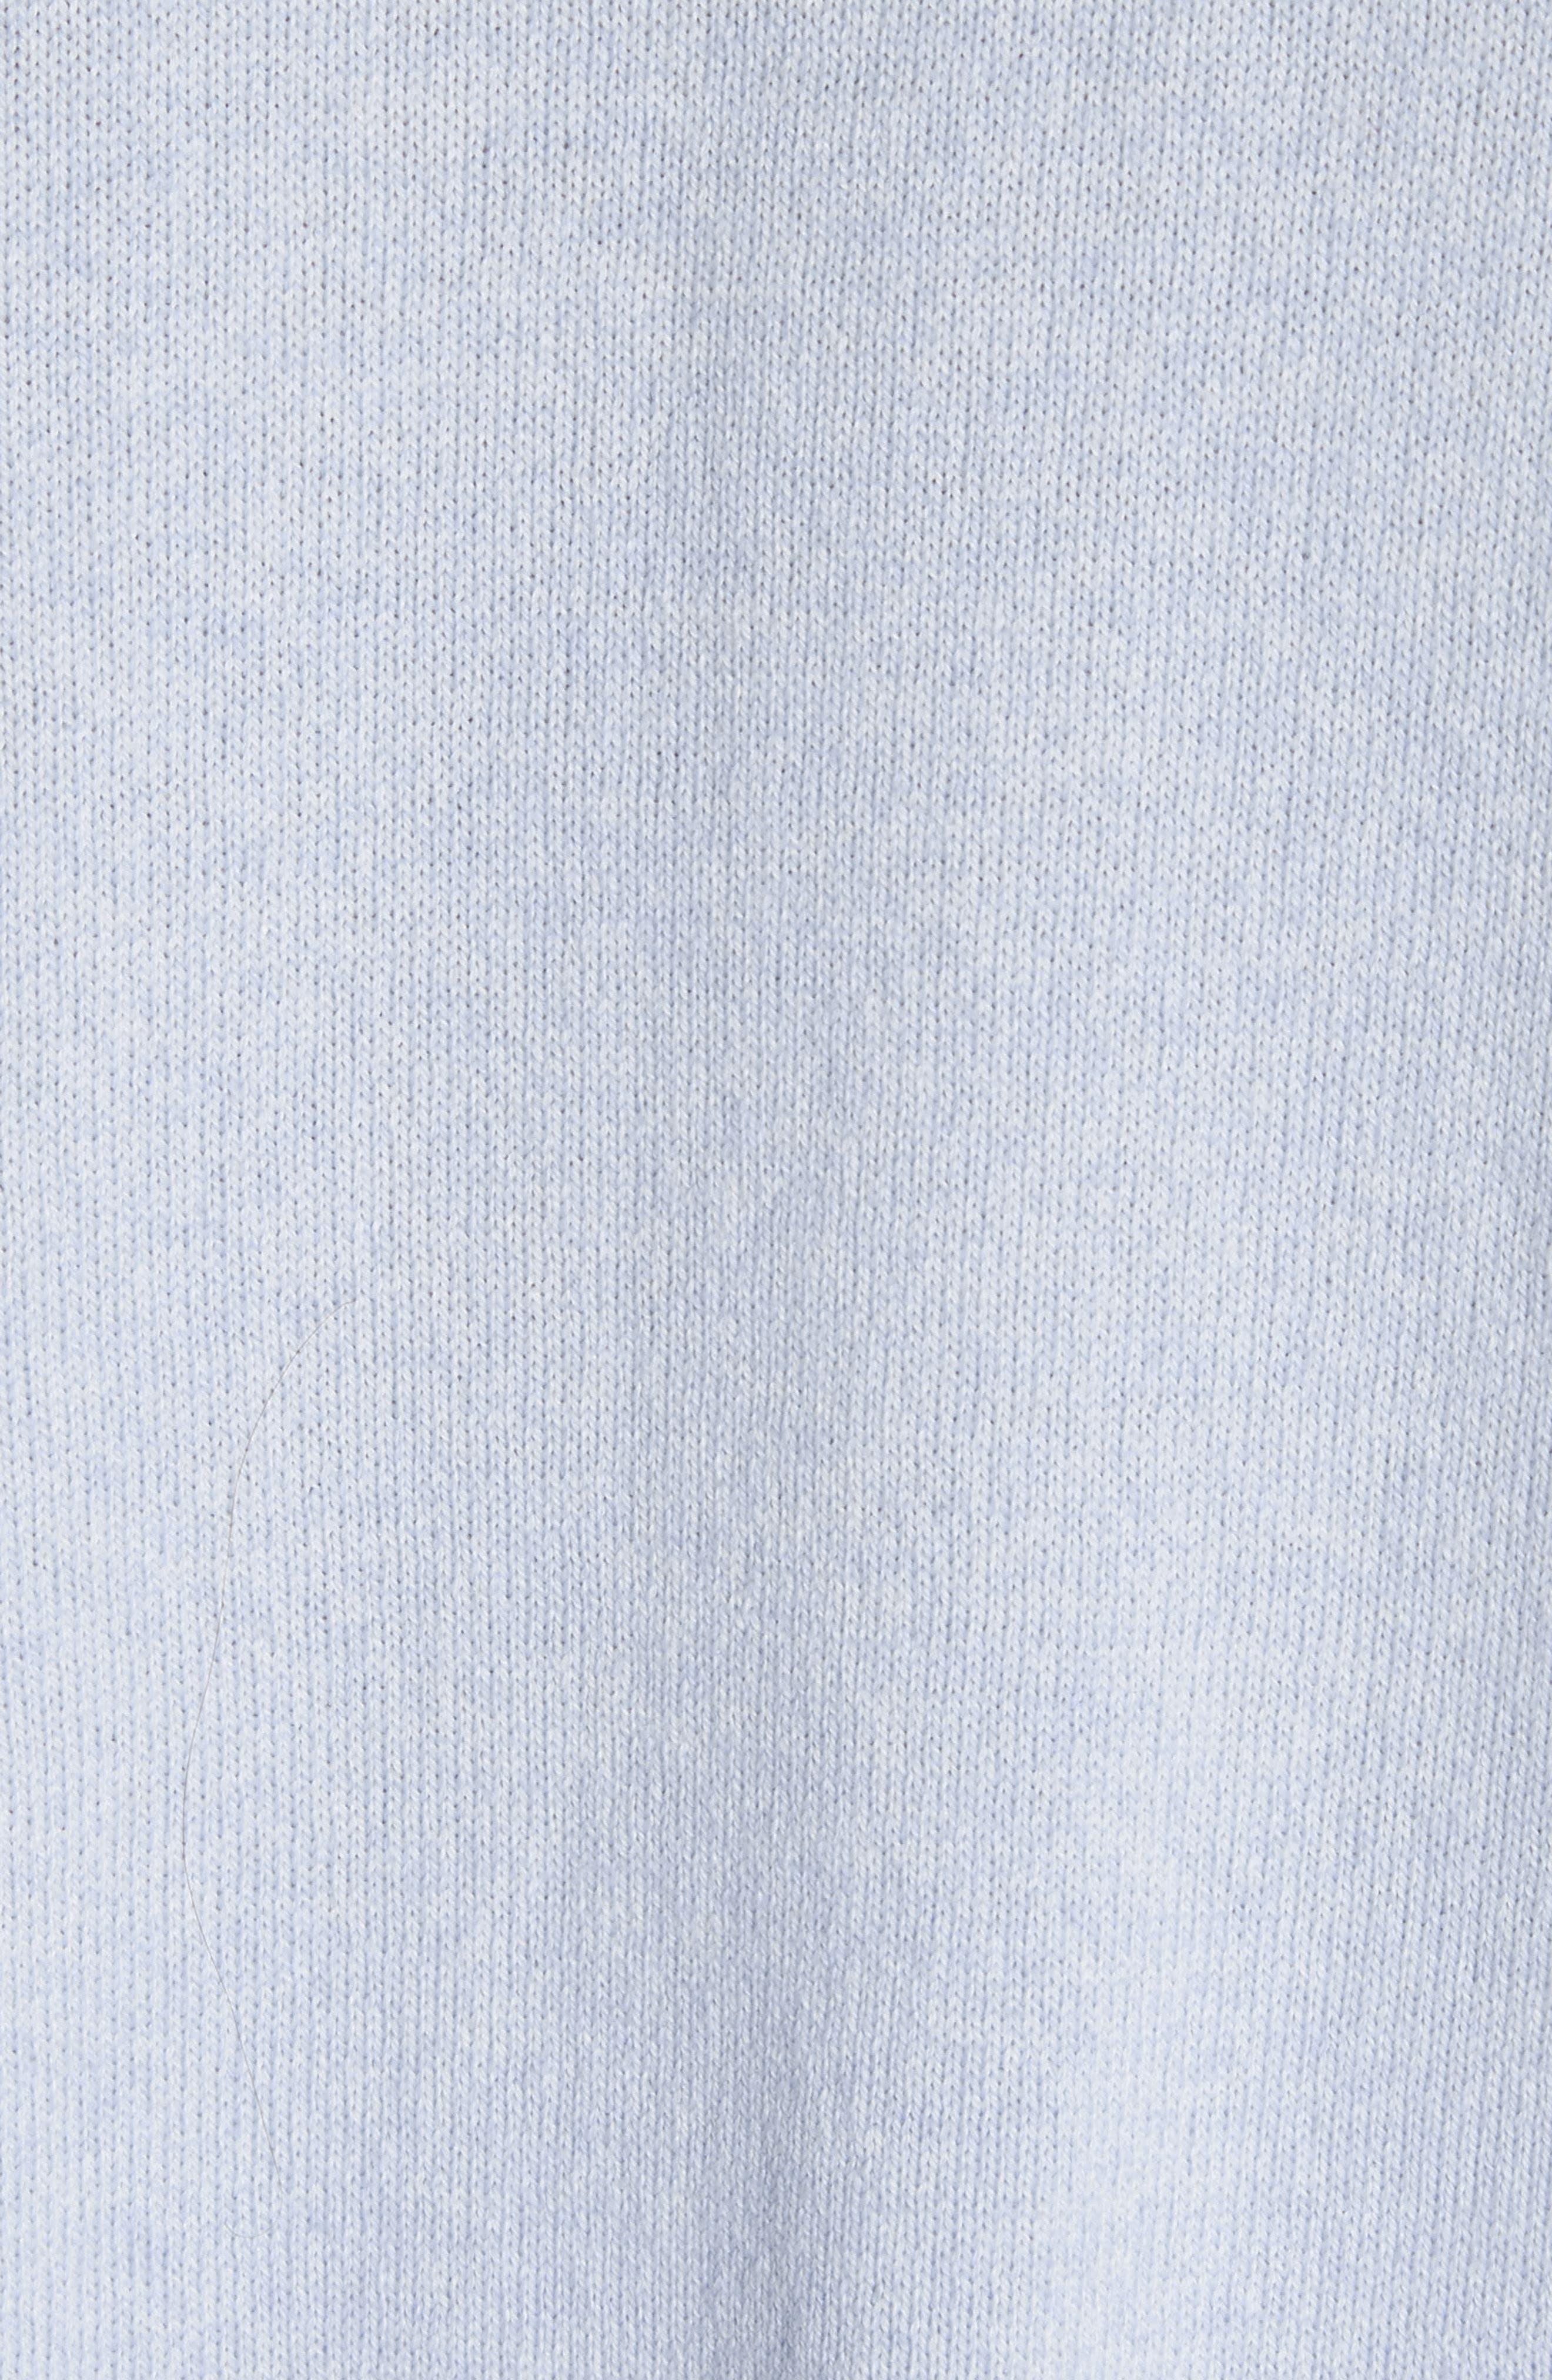 Cotton, Cashmere & Silk Oversized Scoop Neck Sweater,                             Alternate thumbnail 5, color,                             Pale Blue Melange